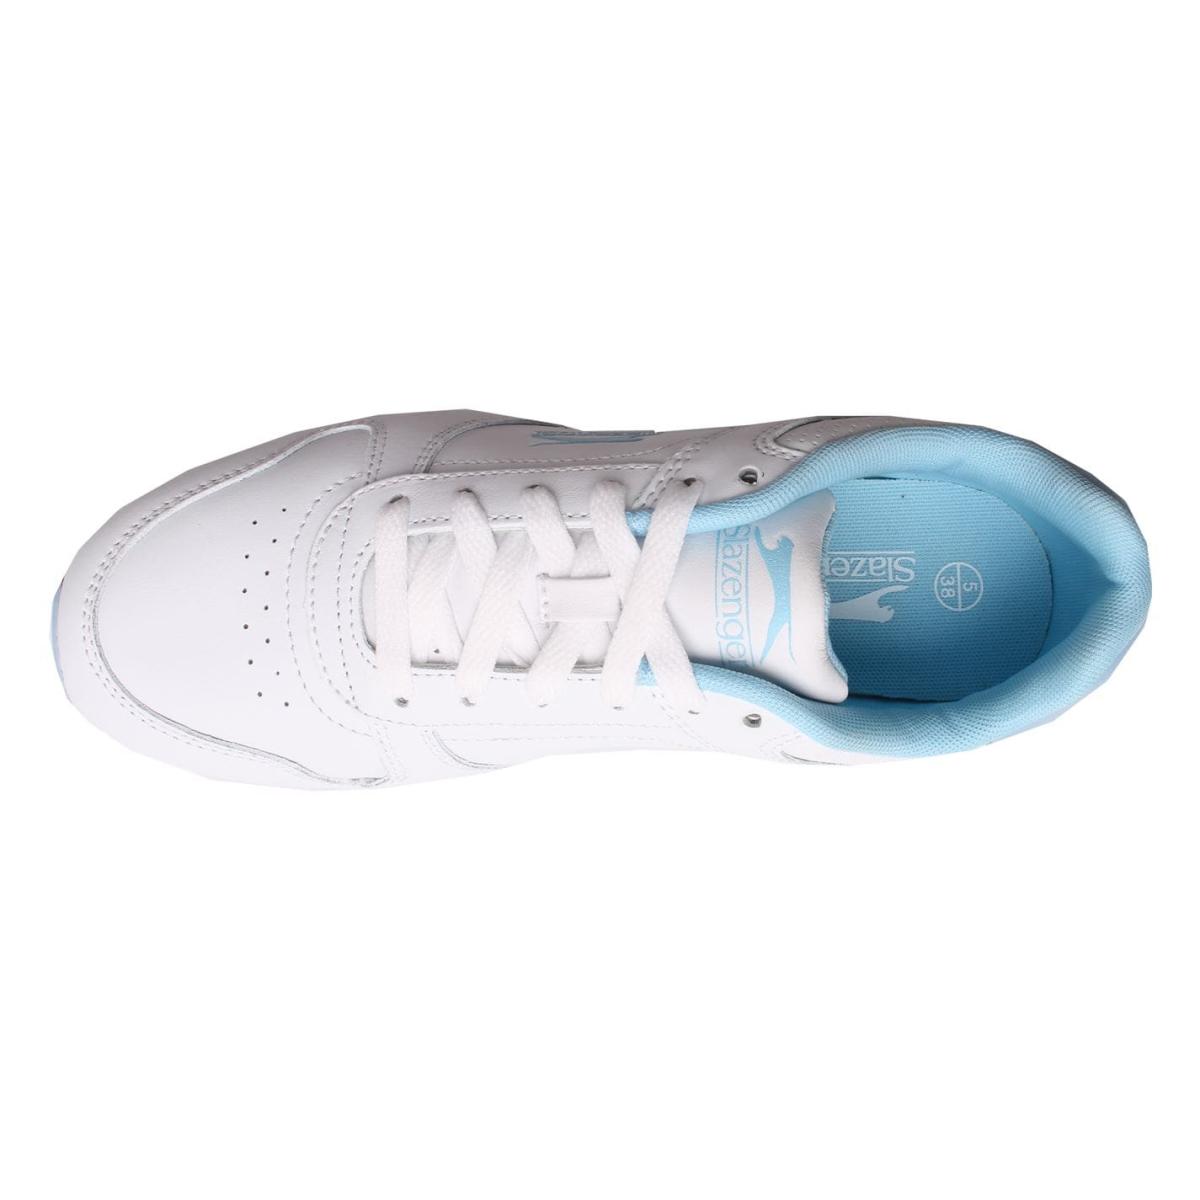 Slazenger-Classic-Turnschuhe-Laufschuhe-Damen-Sportschuhe-Sneaker-1265 Indexbild 19